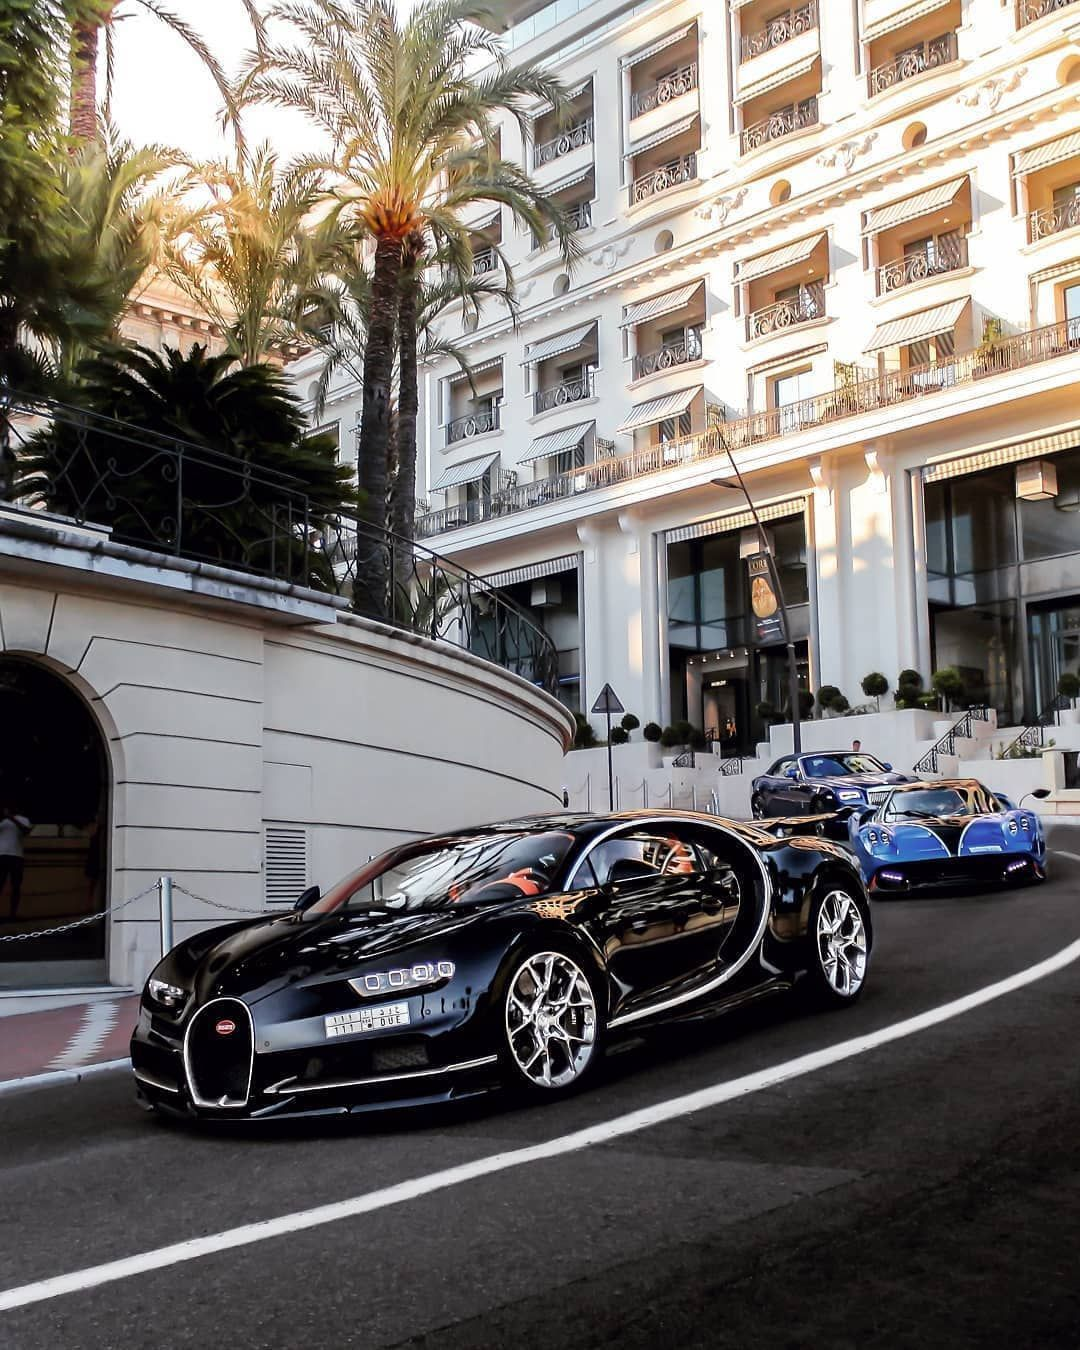 Bugatti Chiron  Photo by @balco  Hashtags: Bugatti Chiron  Photo by @balco  Hashtags: